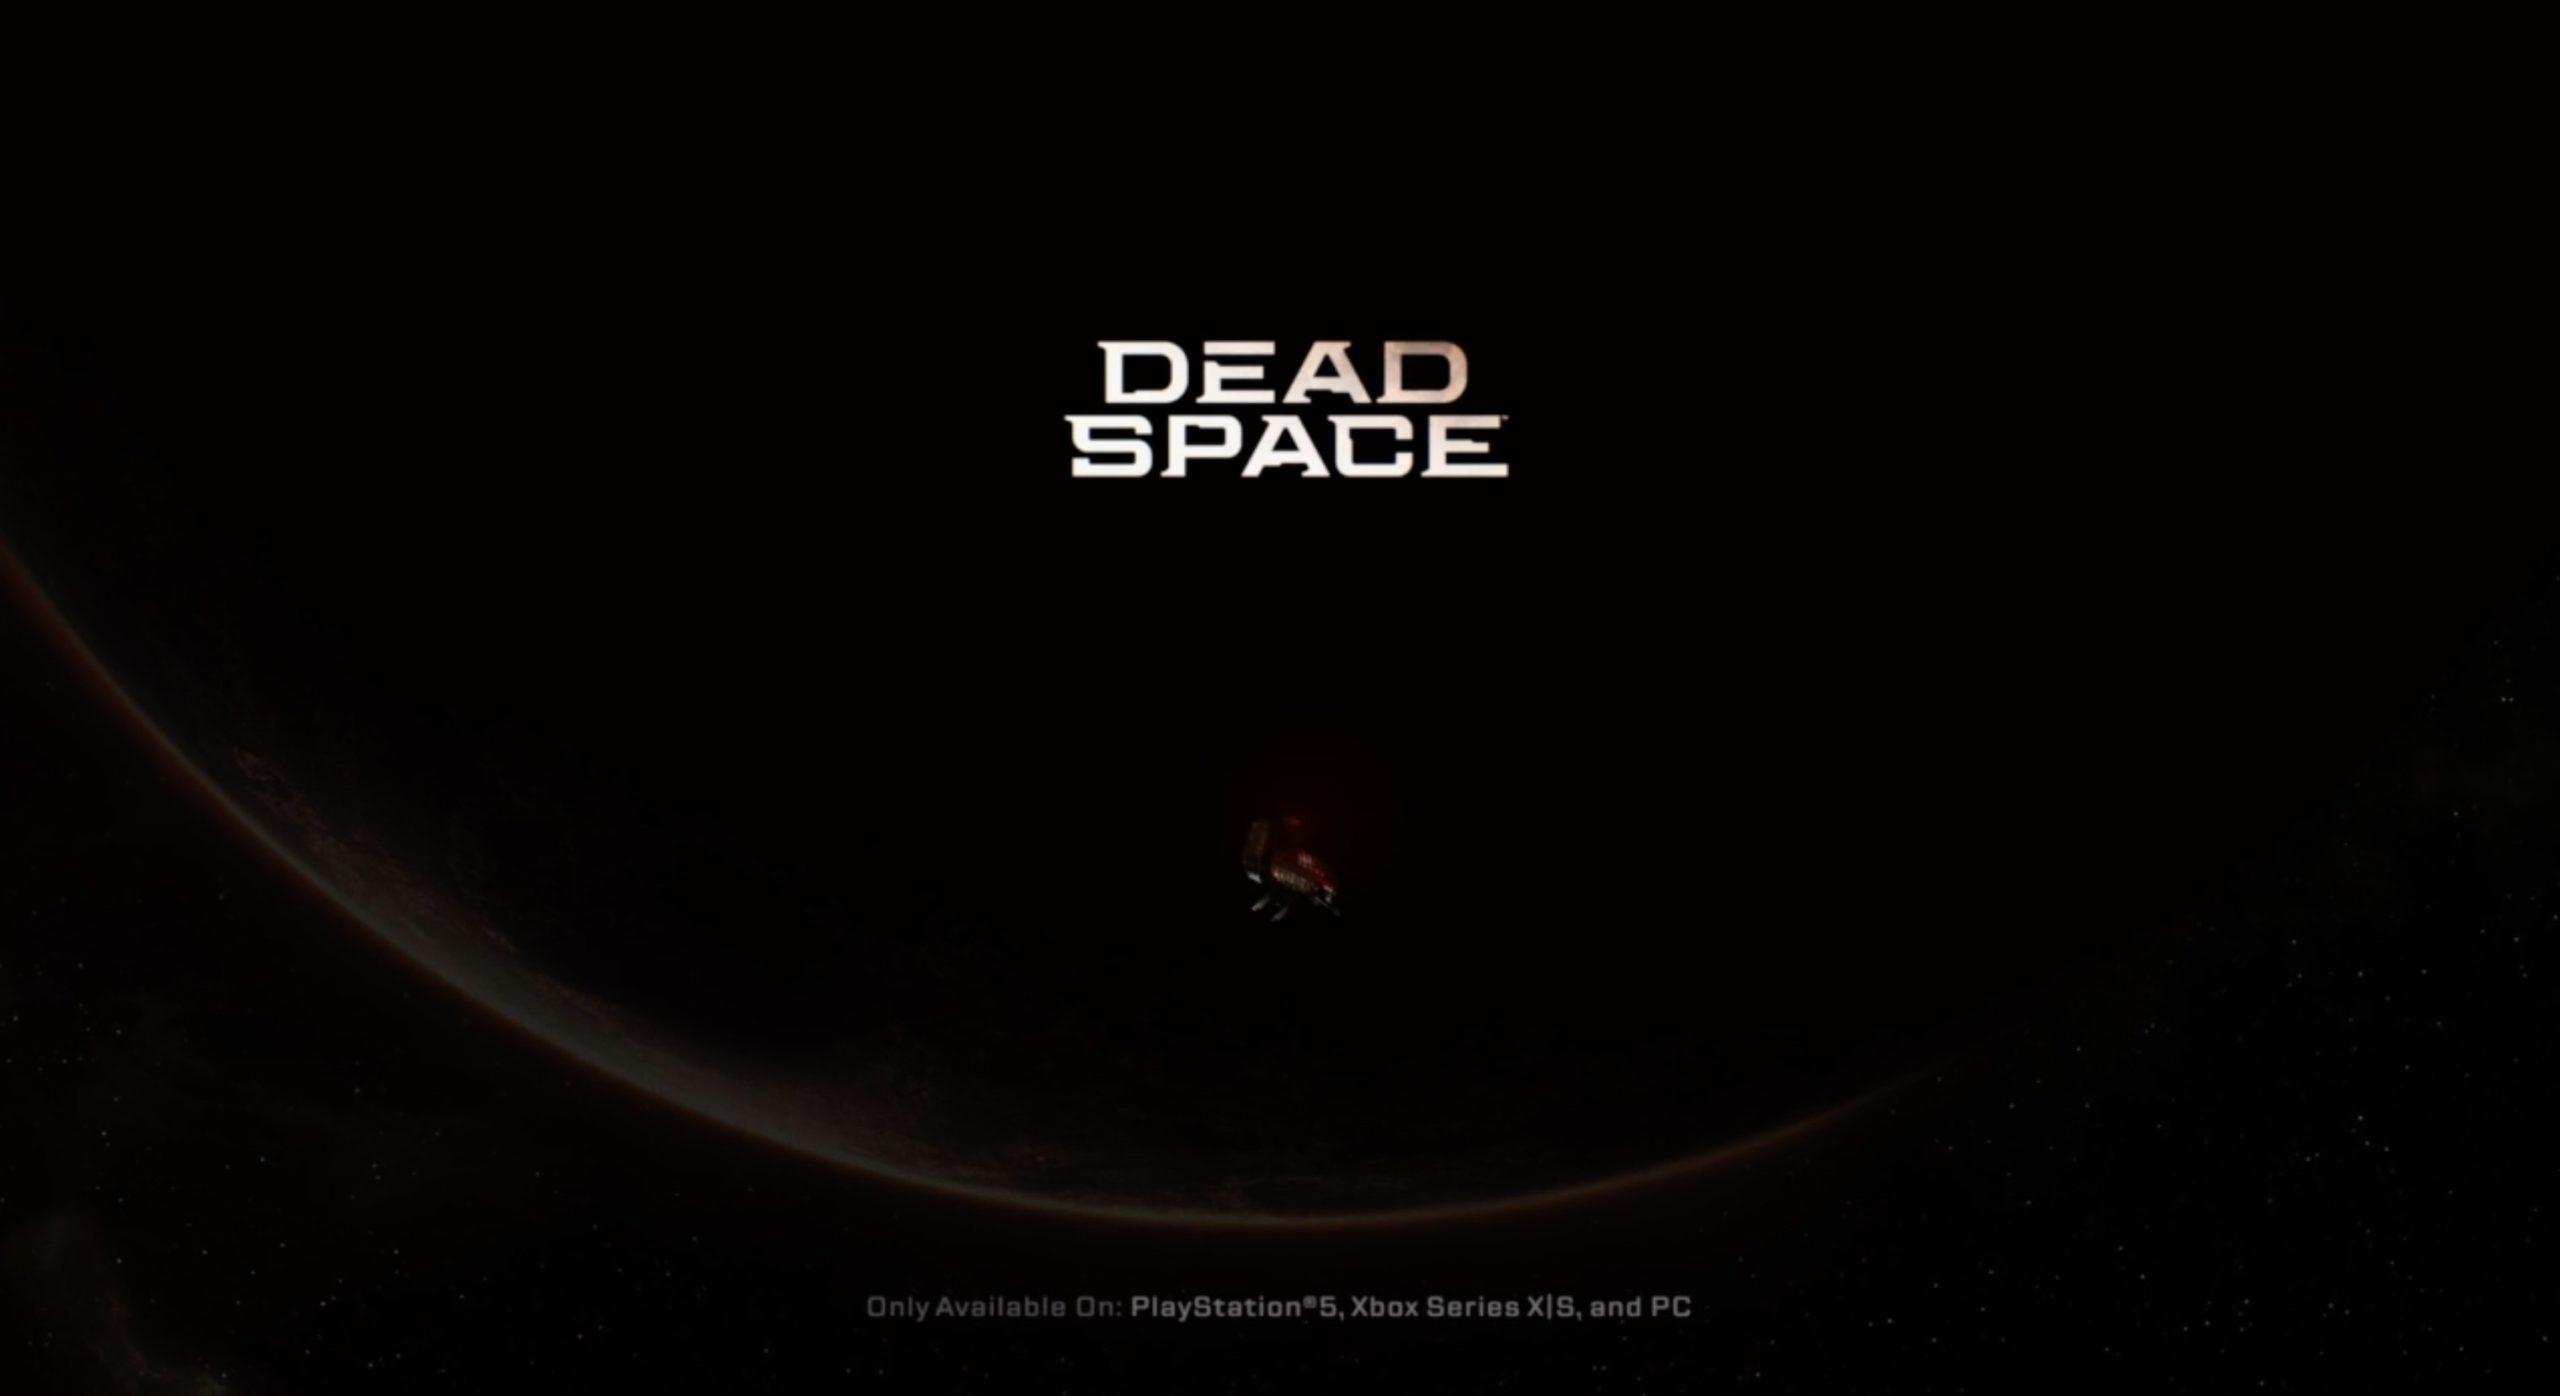 Dead Space EA Games PS5 Xbox Series X/S PC